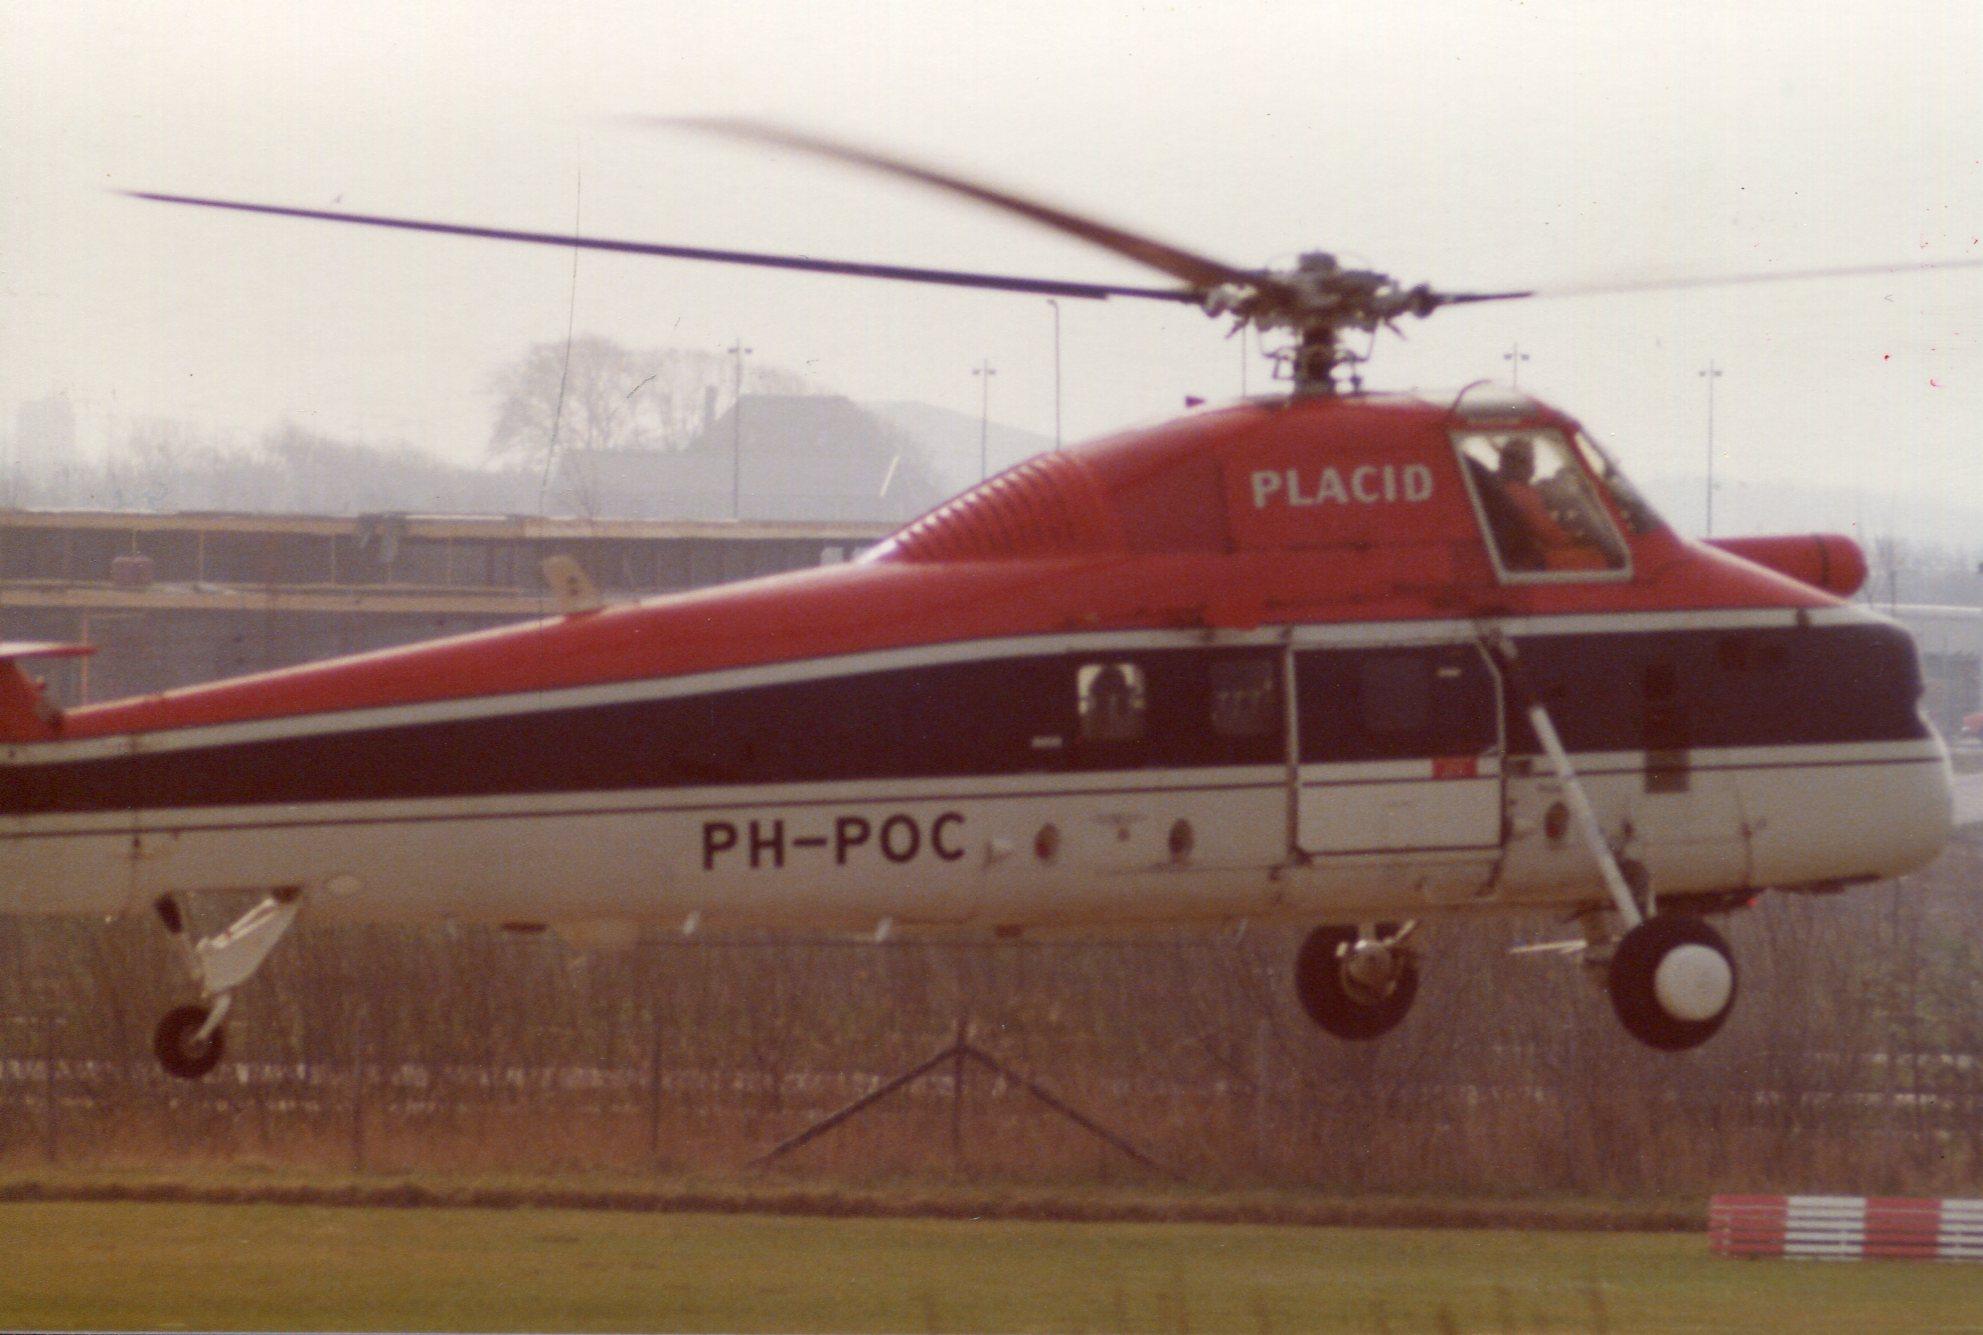 Naam: Den Helder , april 1977.jpg Bekeken: 417 Grootte: 279,4 KB